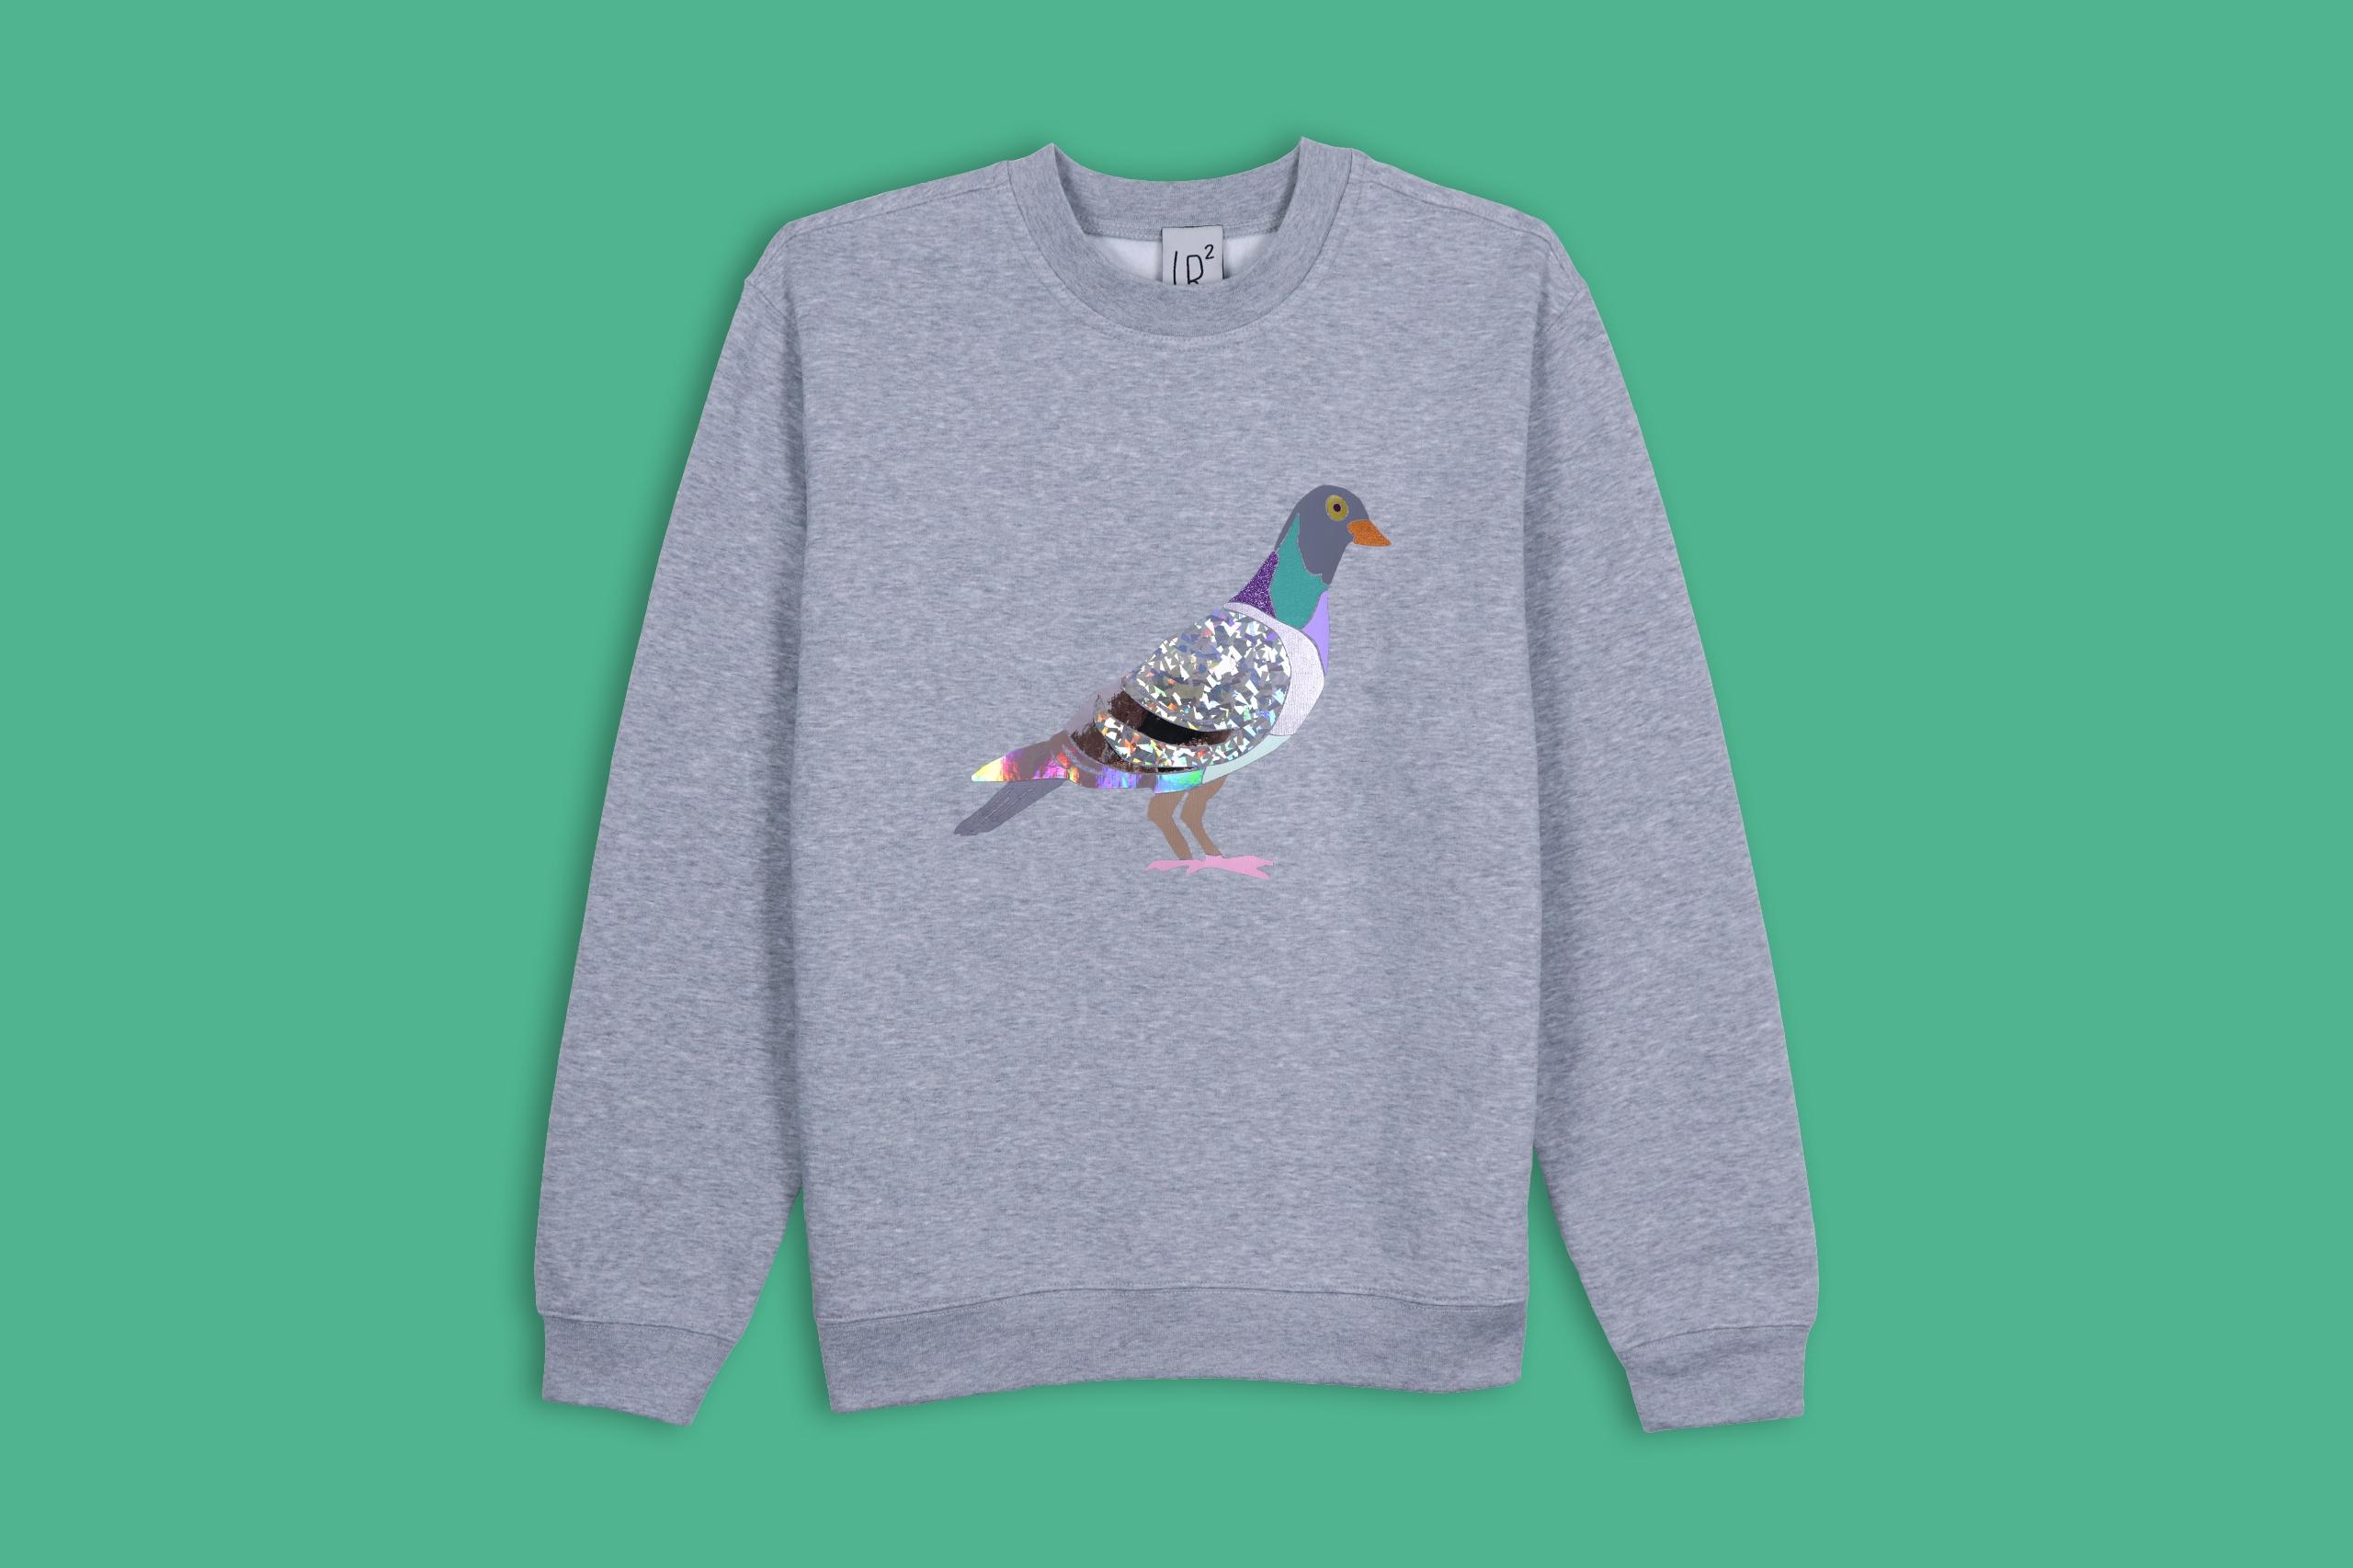 PIGEON sweater online - fashion - lbxlb_studio | ello